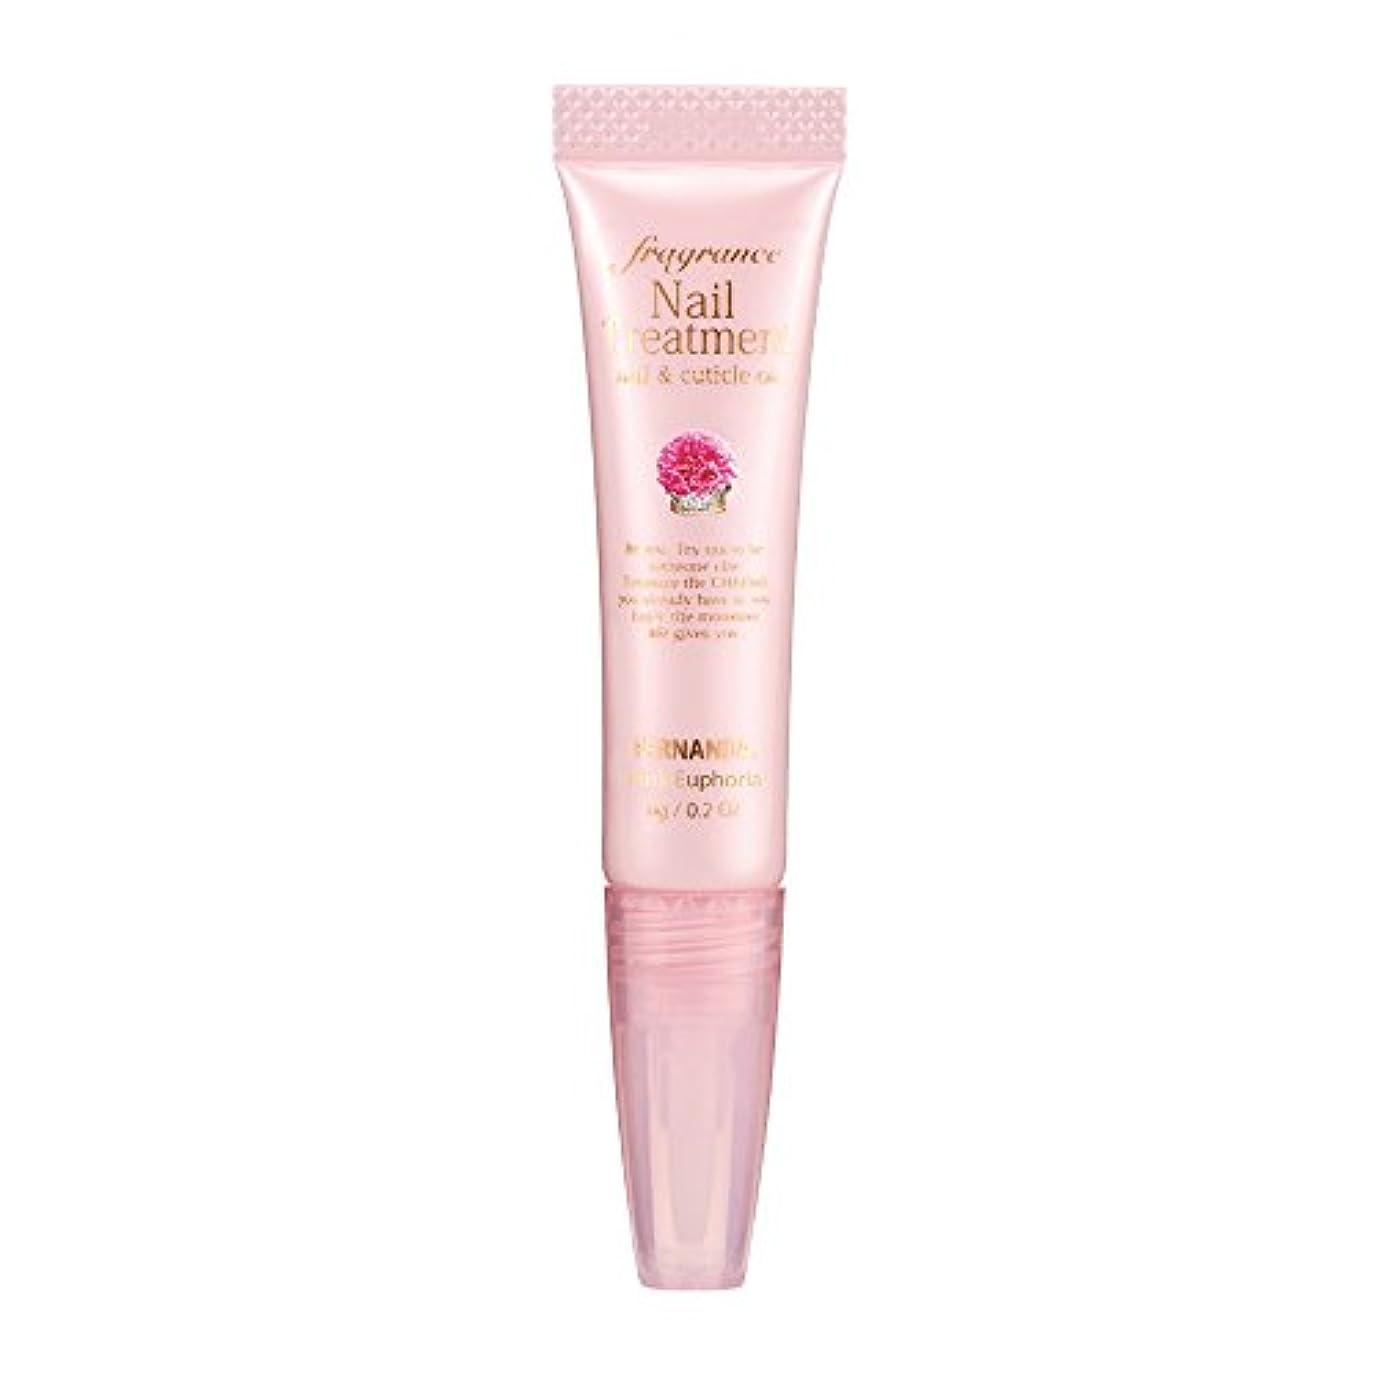 FERNANDA(フェルナンダ) Fragrance Nail Treatment Pink Euphoria (ネイルトリートメント ピンクエウフォリア)